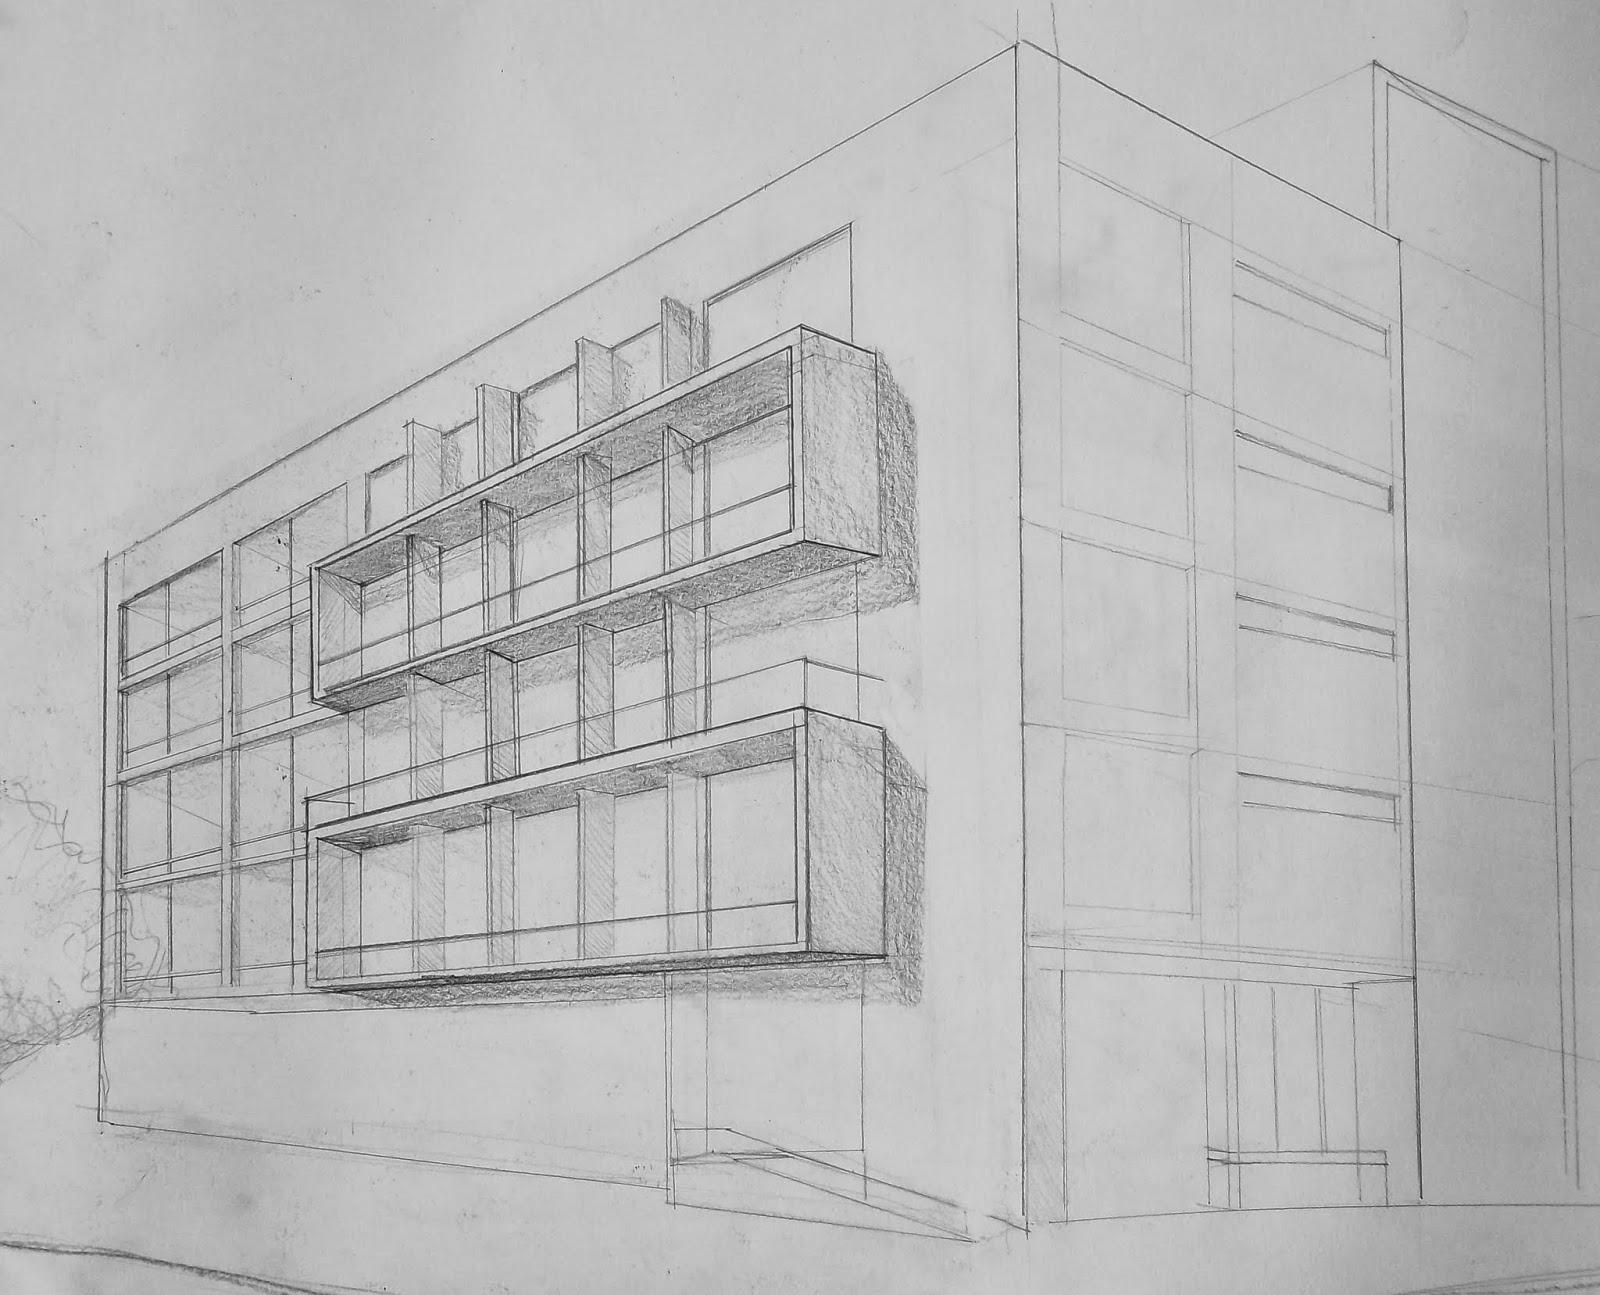 Arquitectura y dise o perspectiva oblicua for Blog arquitectura y diseno